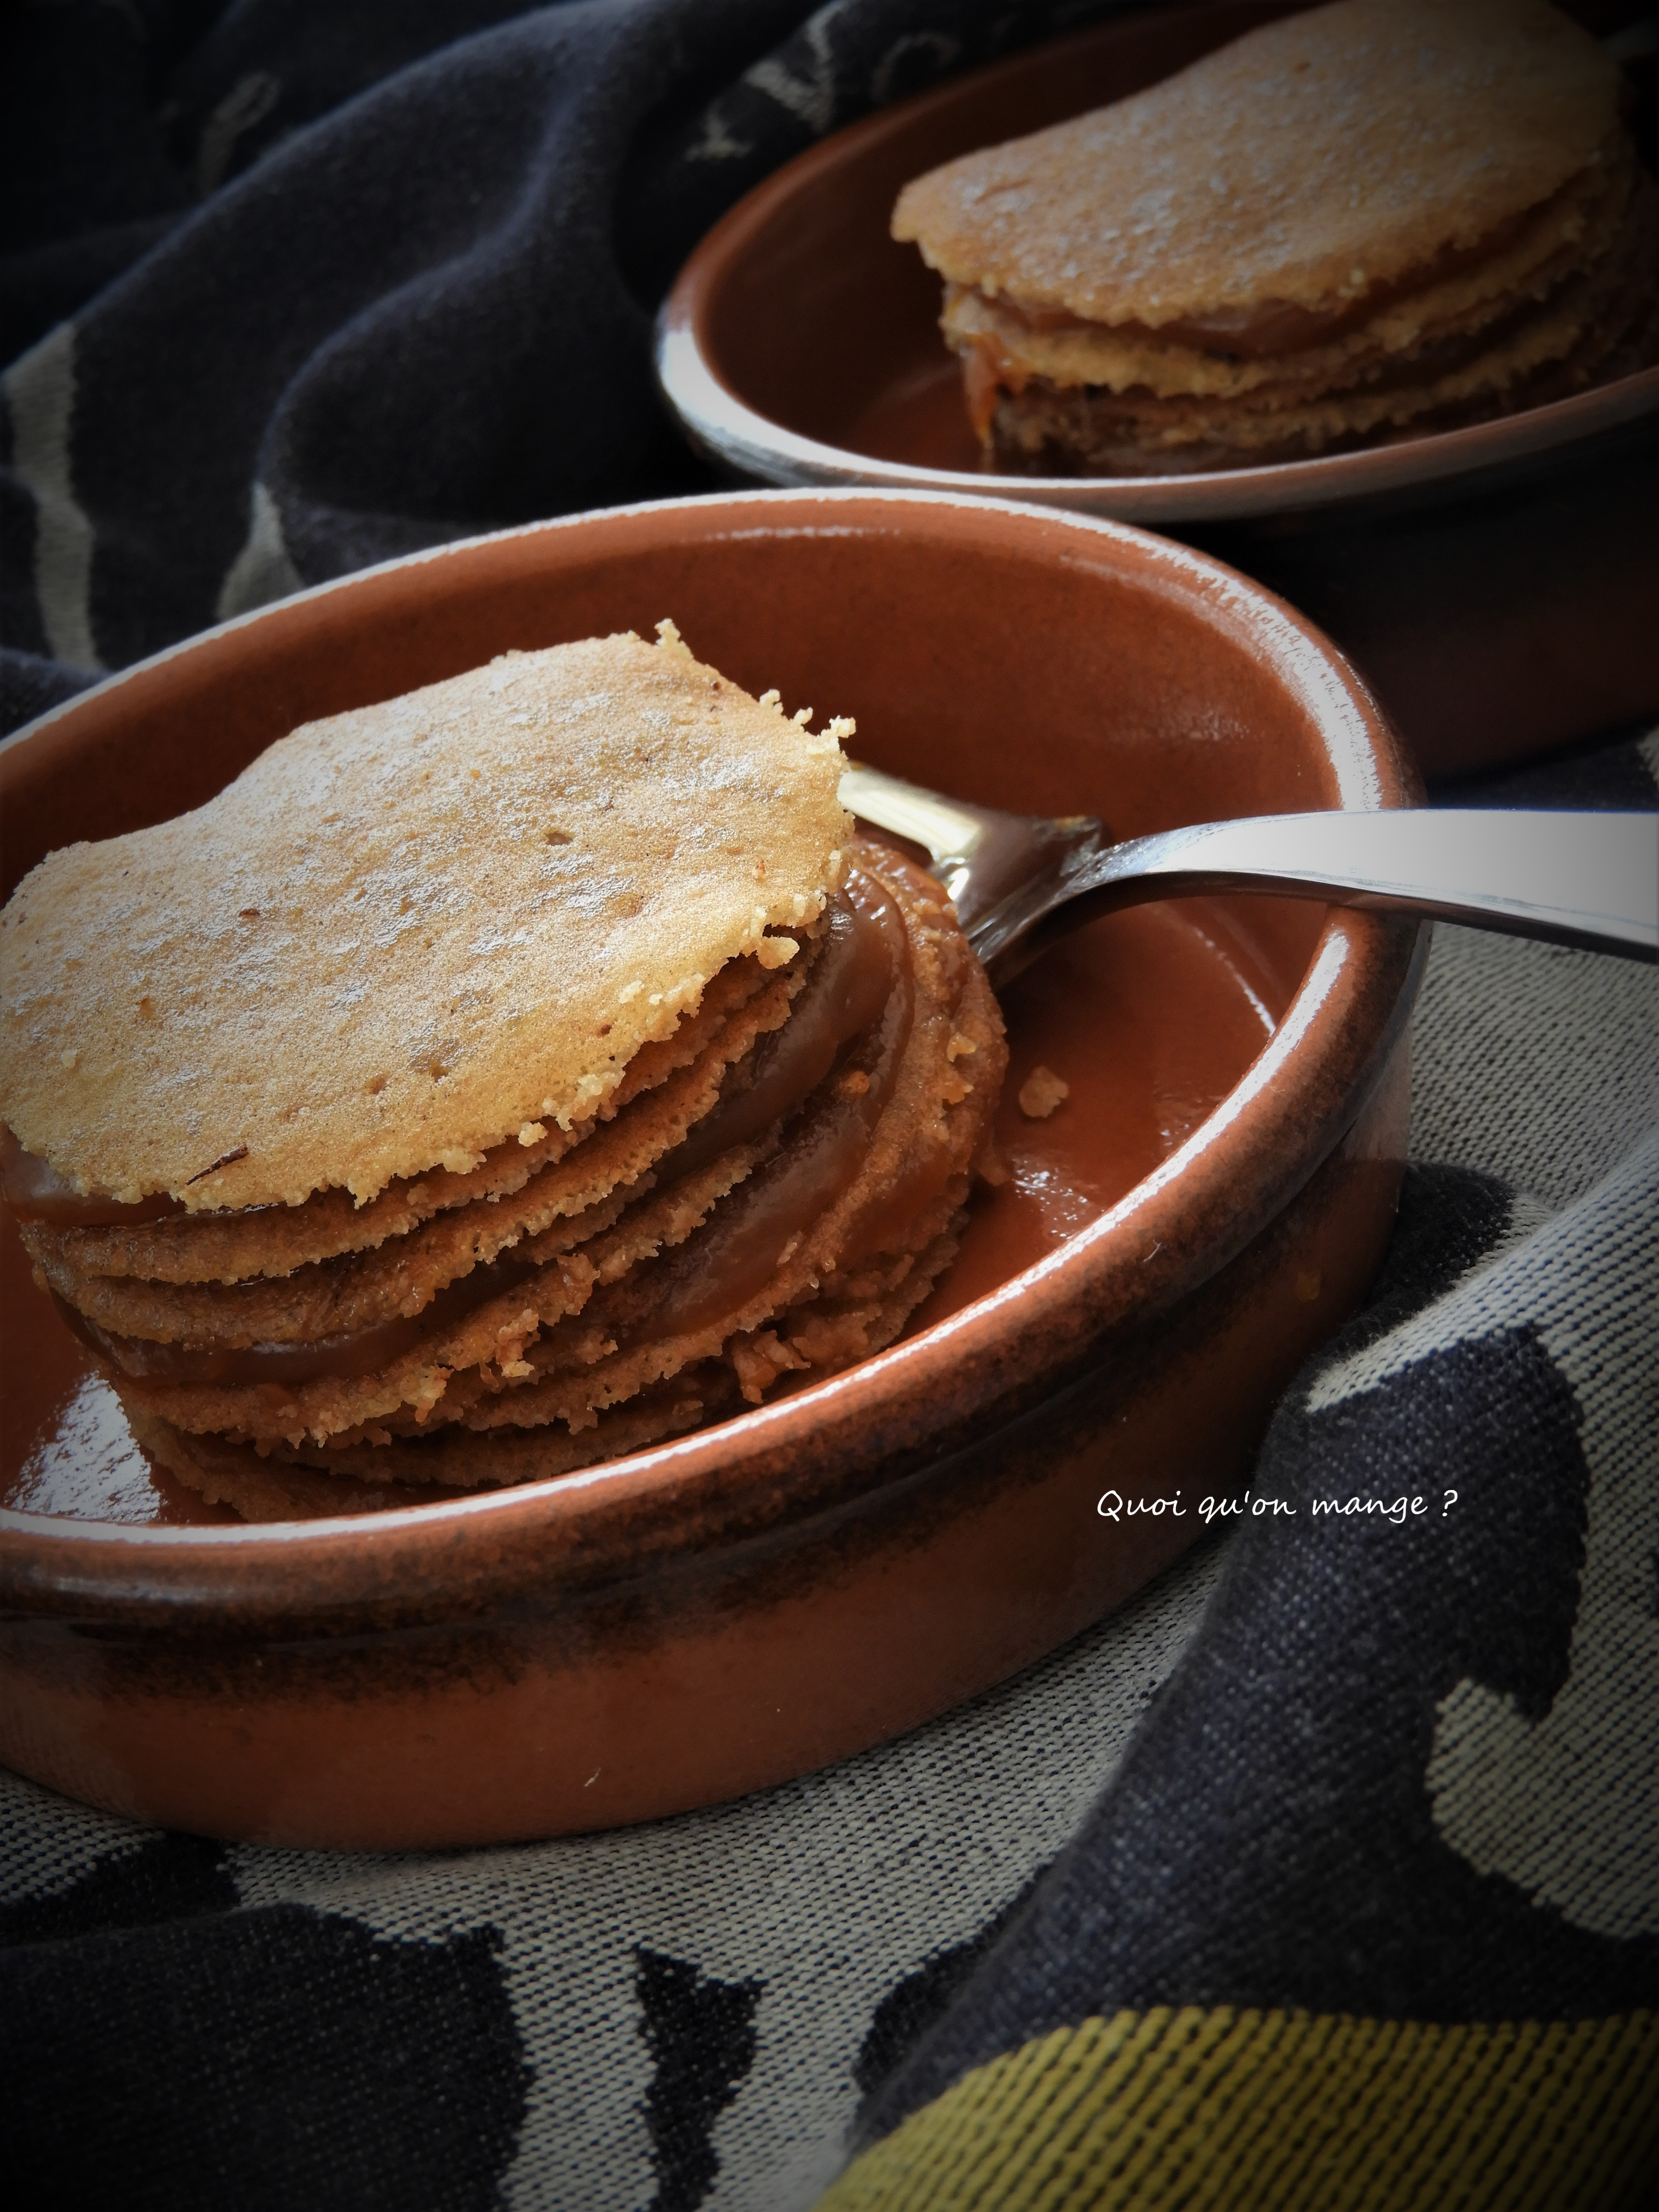 Petit gâteau de crêpes fourré de caramel au beurre salé